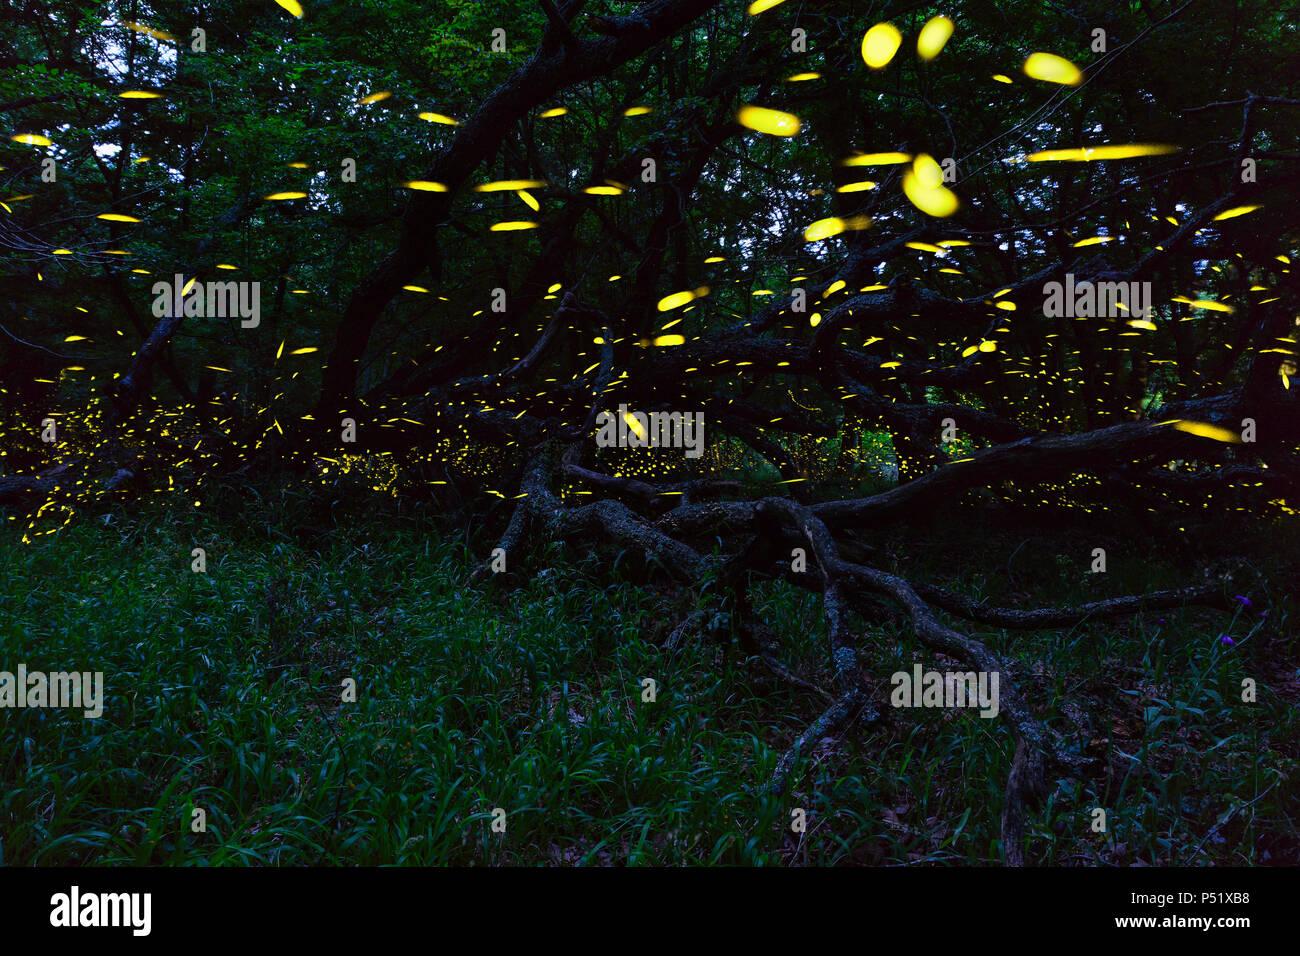 Fireflies flying in forest near Burgas city, Bulgaria. Fireflies in Strandzha mountain. - Stock Image